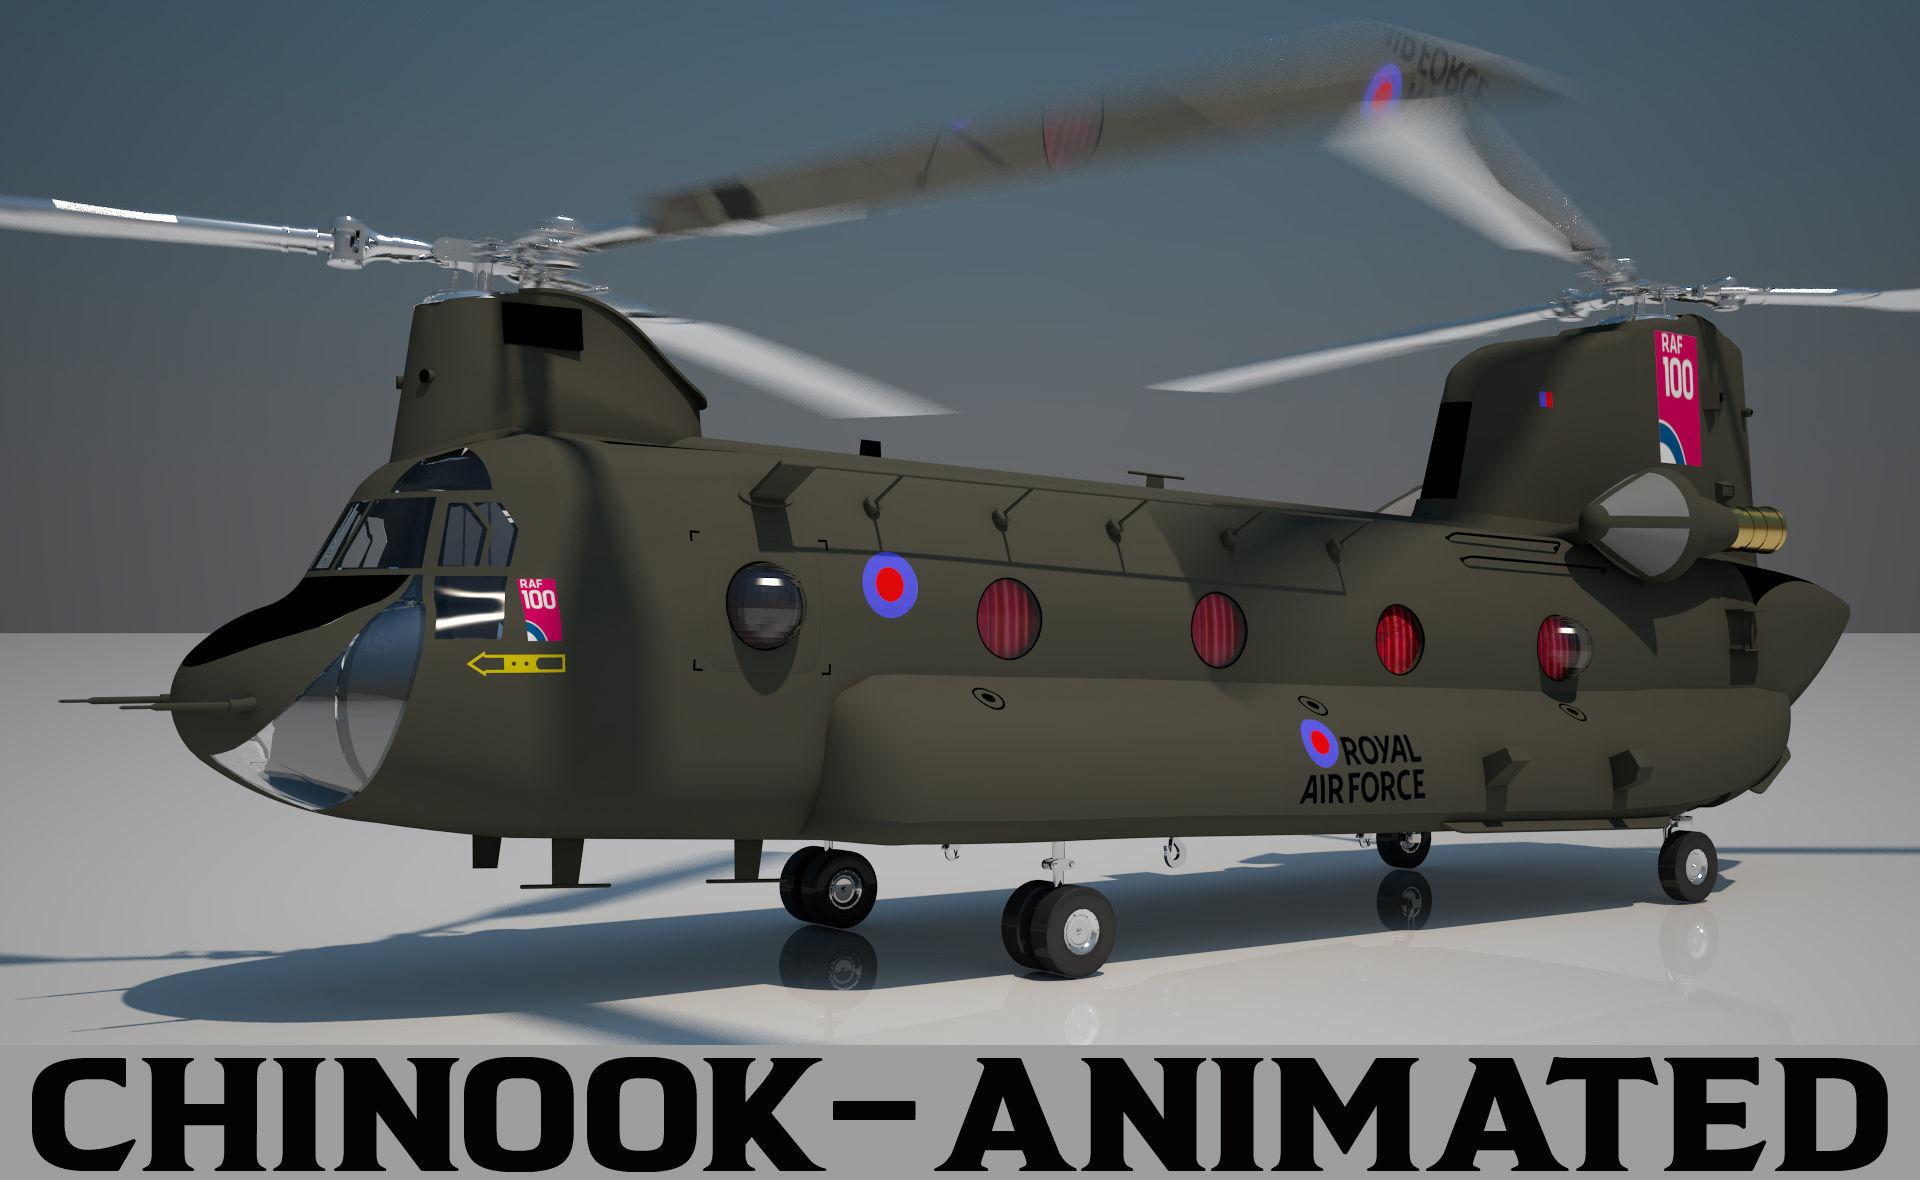 Royal Air force Chinook CH 47